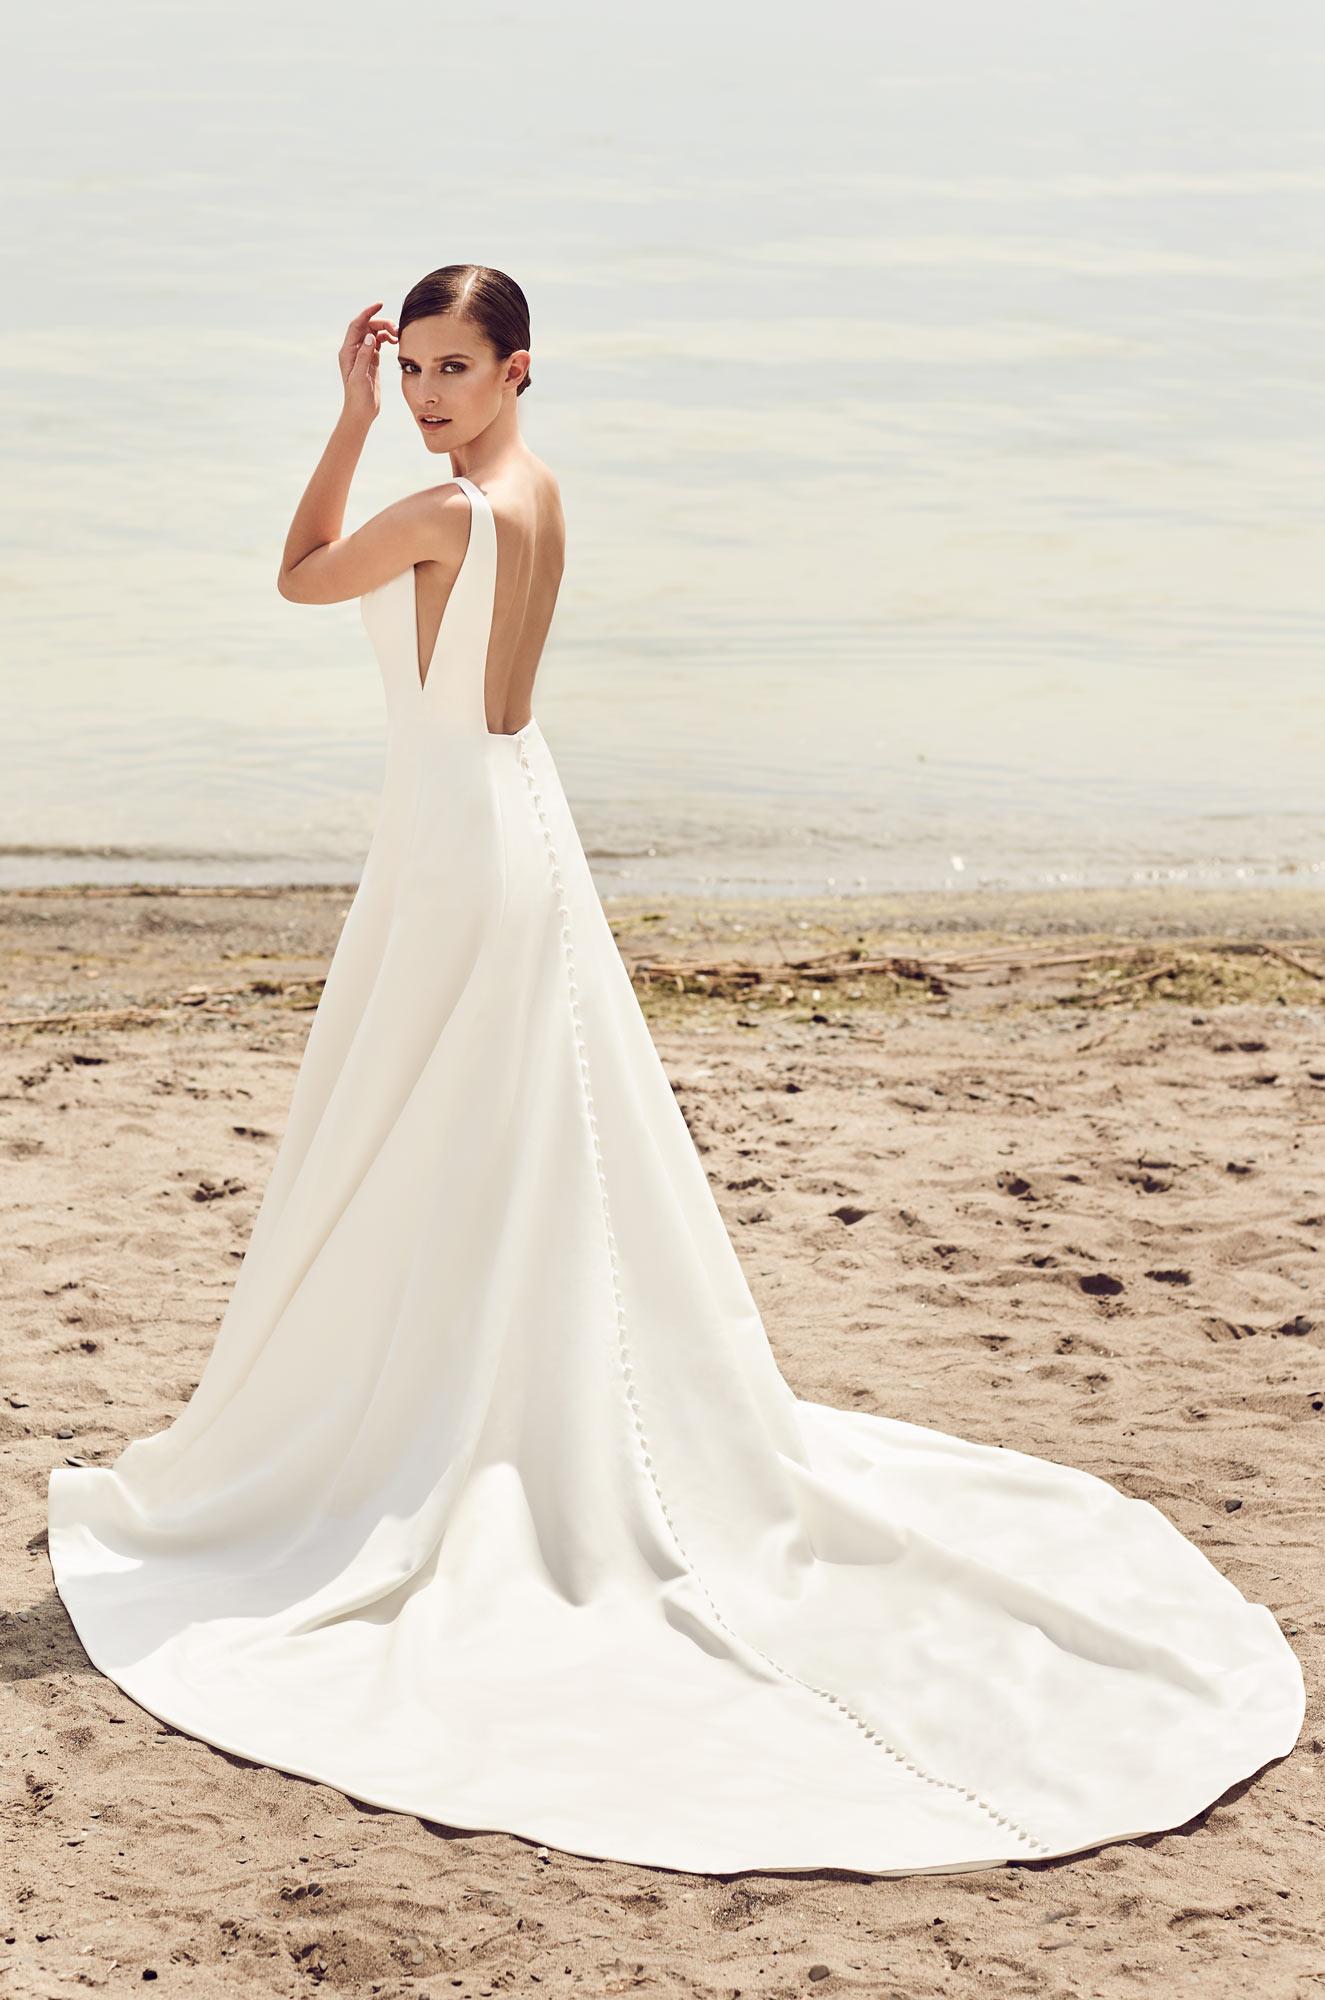 Sleek modern wedding dress style 2115 mikaella bridal for In style wedding dresses